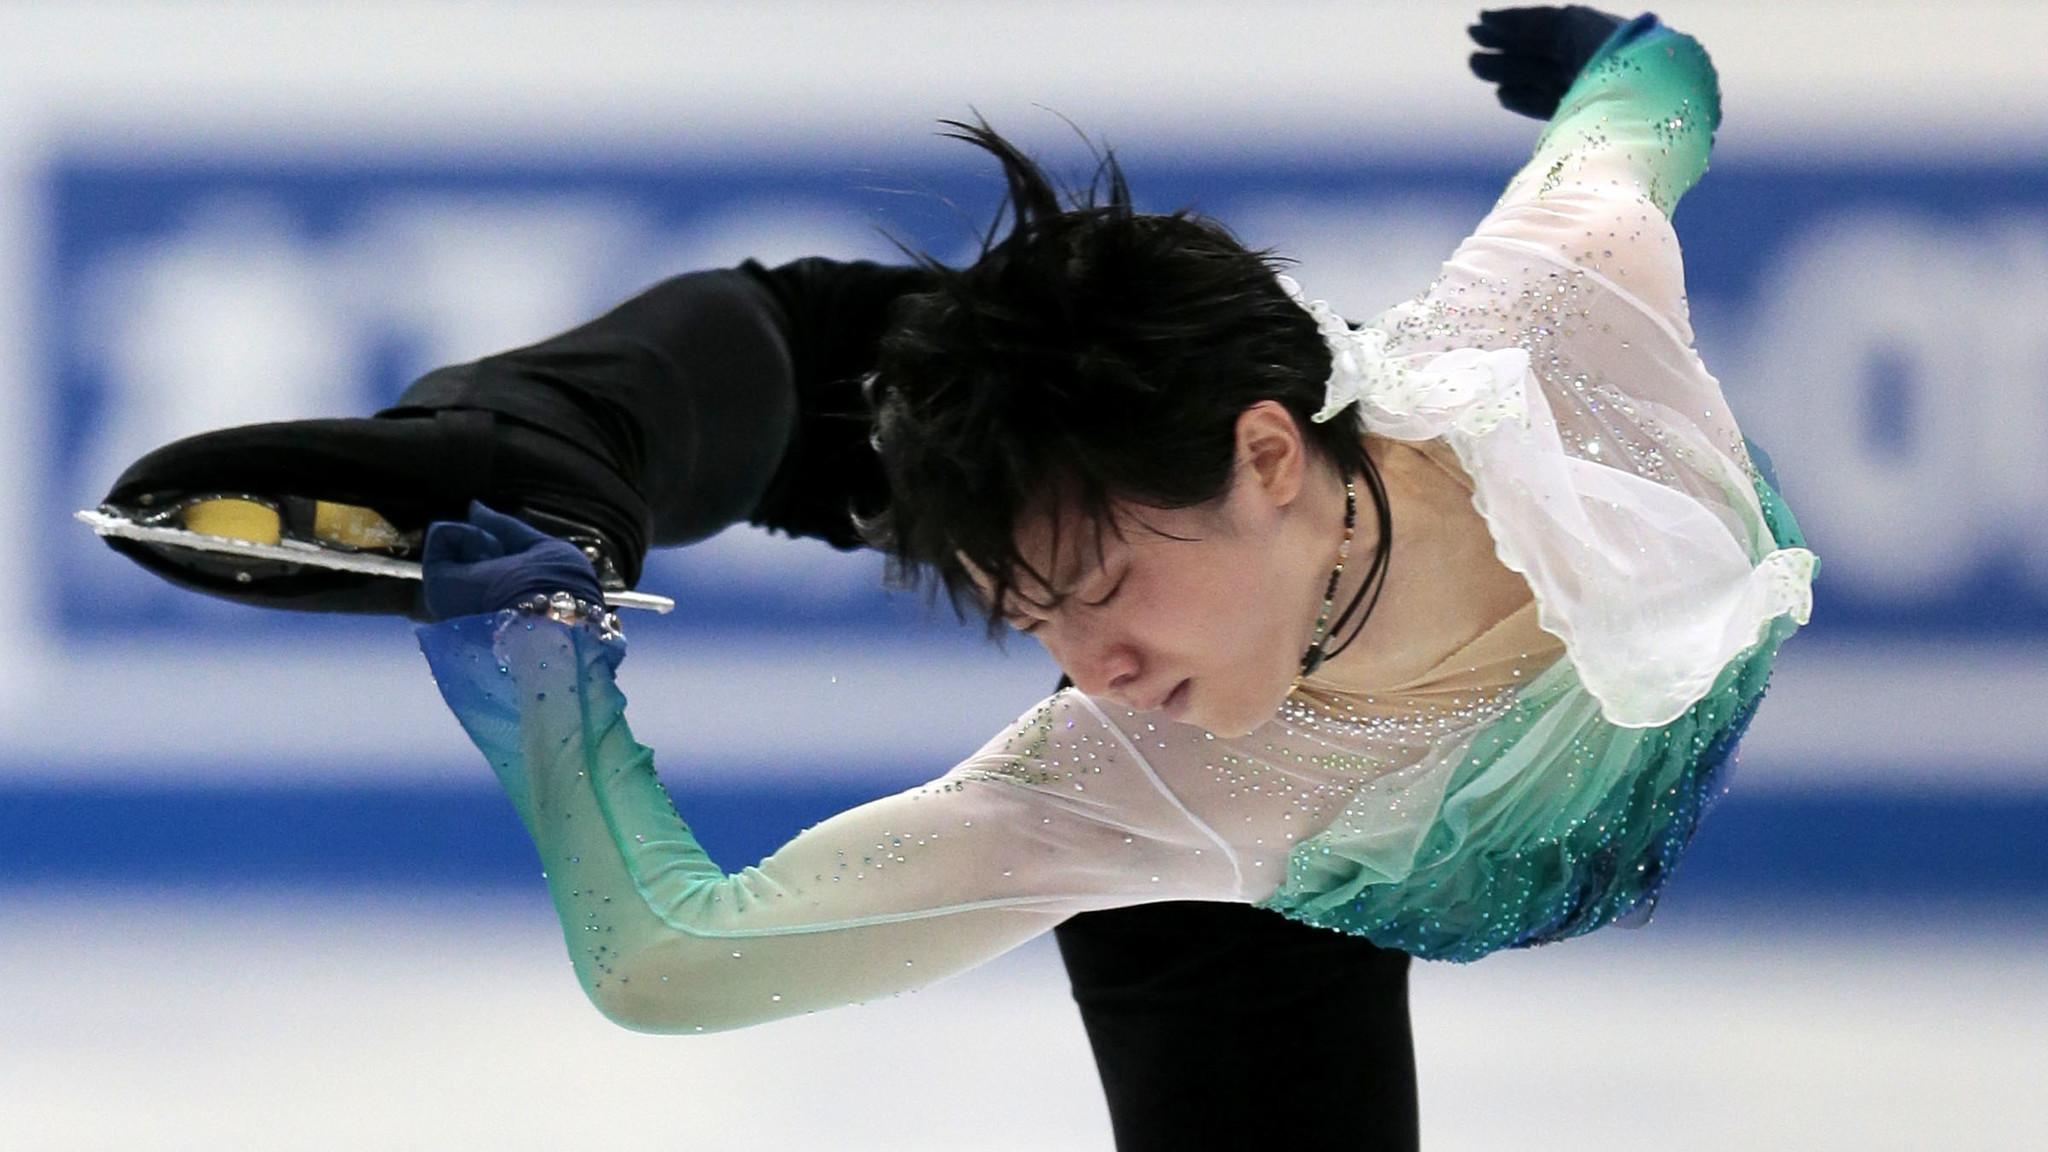 HQ Figure Skating Wallpapers | File 441.09Kb